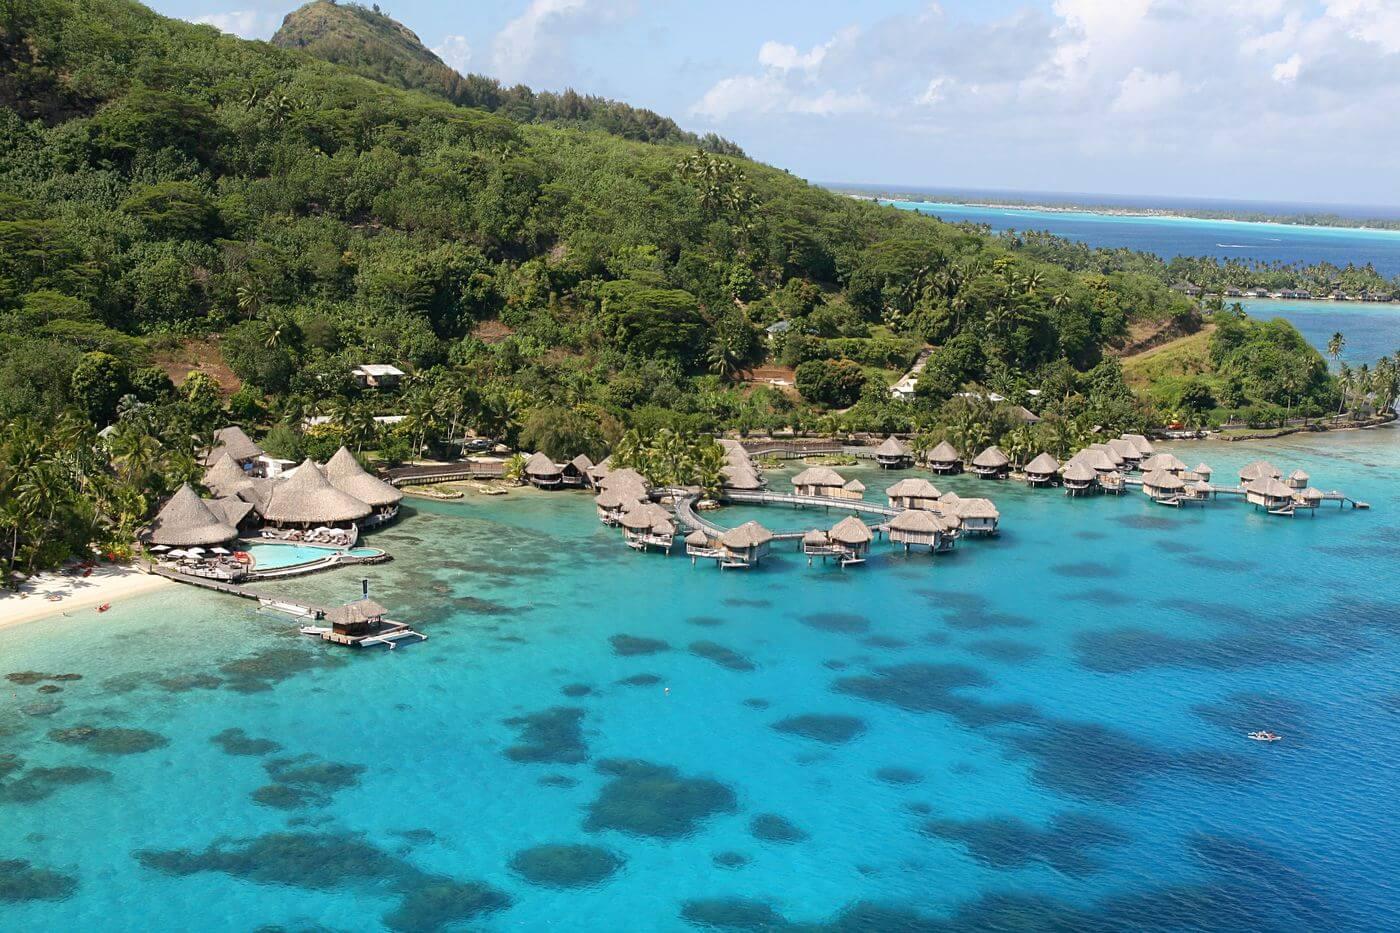 aerial view of Sofitel Marara Bora Bora